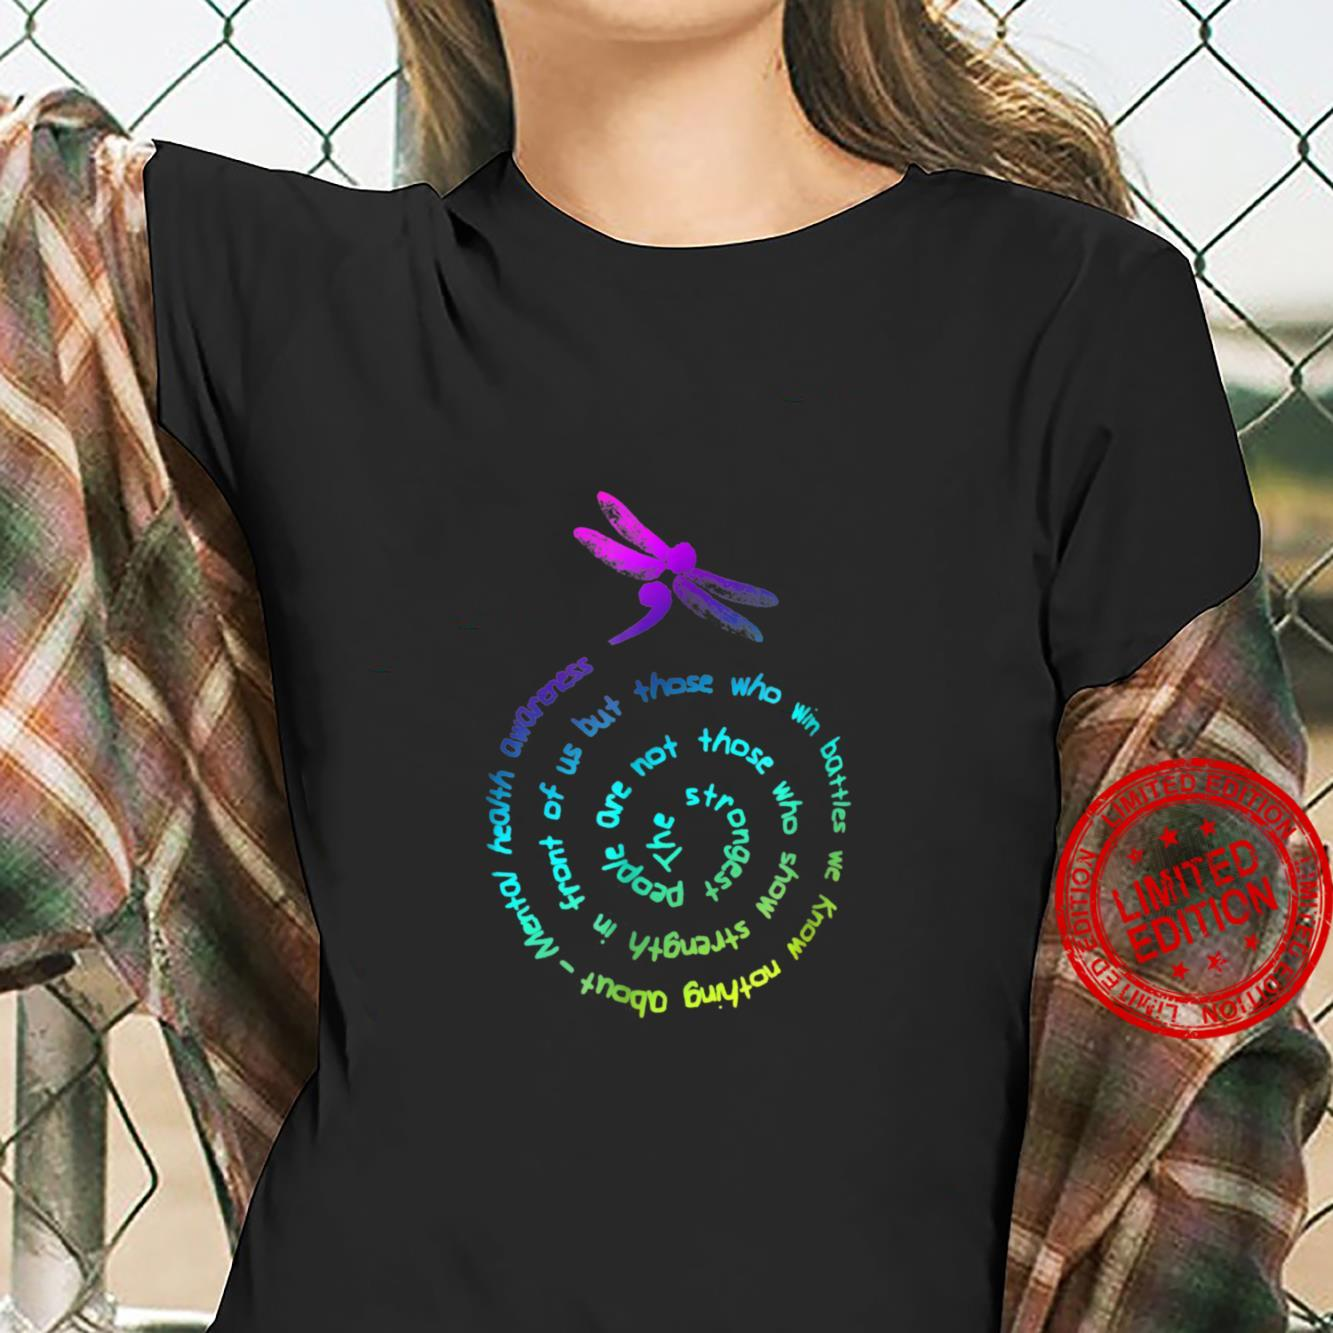 Strongest dragonfly win battle Mental health shirt ladies tee